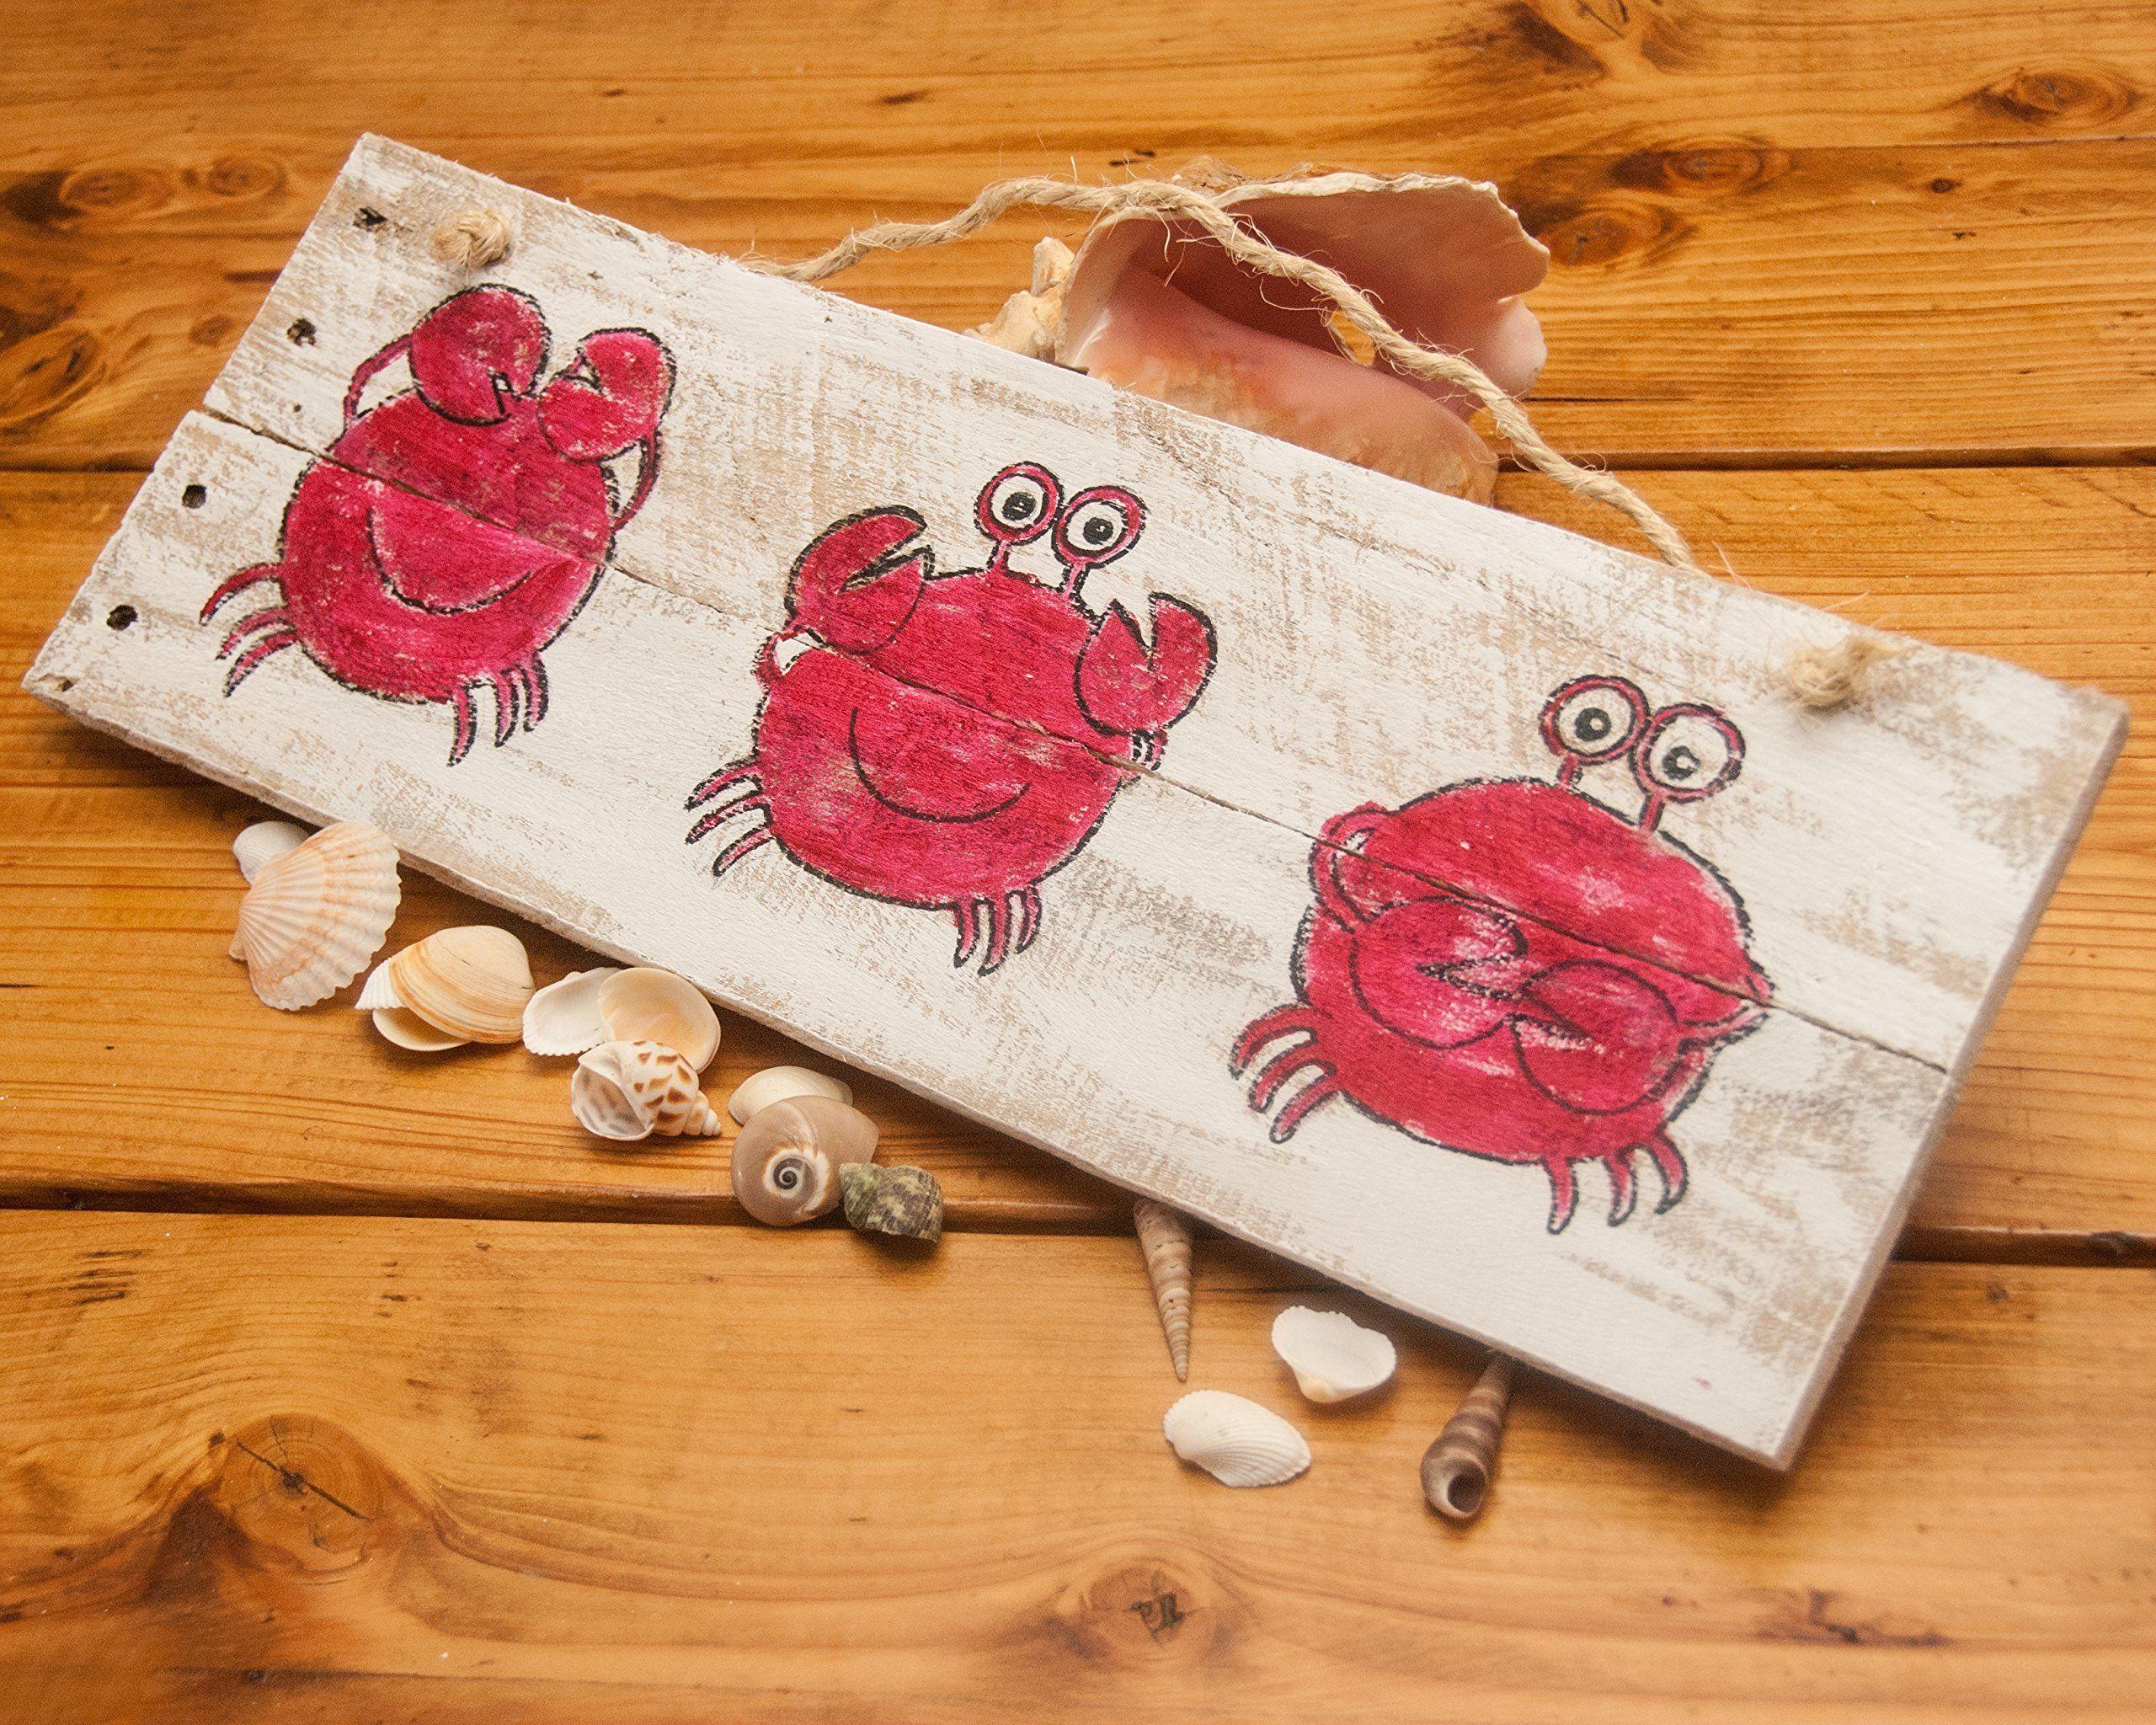 See no evil crab decor rustic beach decor rustic beach sign wood